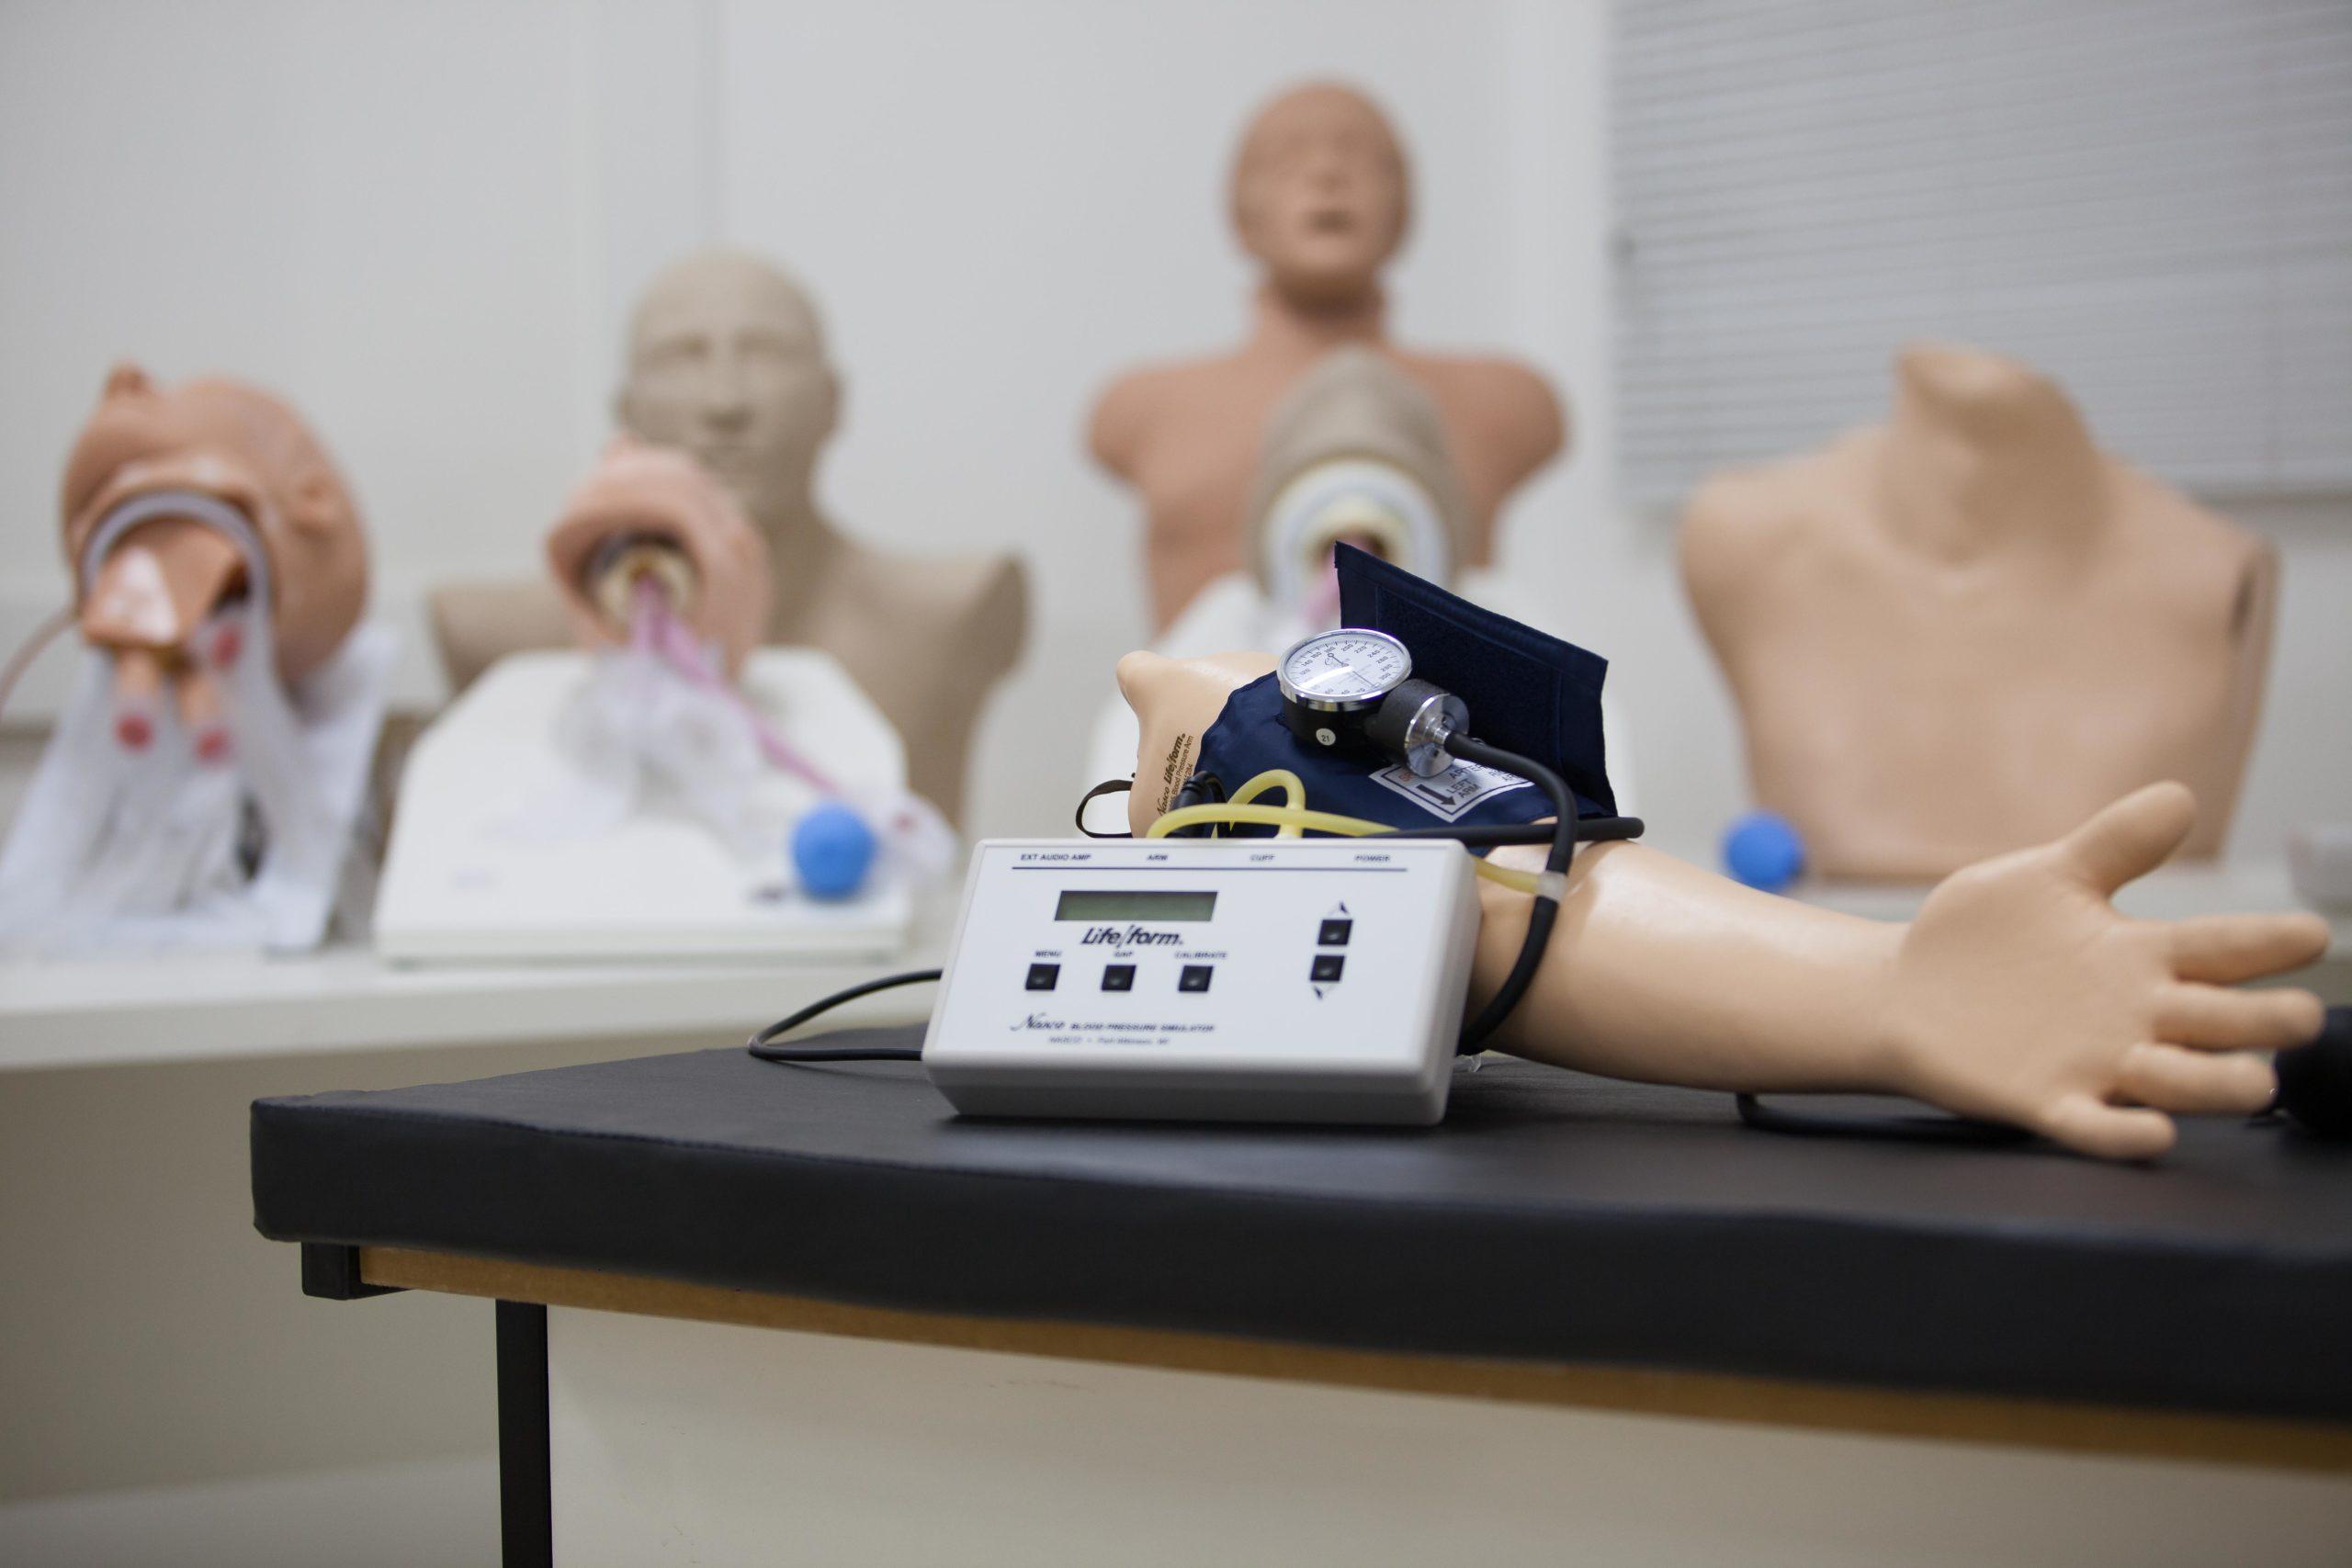 laboratorio-enfermagem-primeiros-socorros